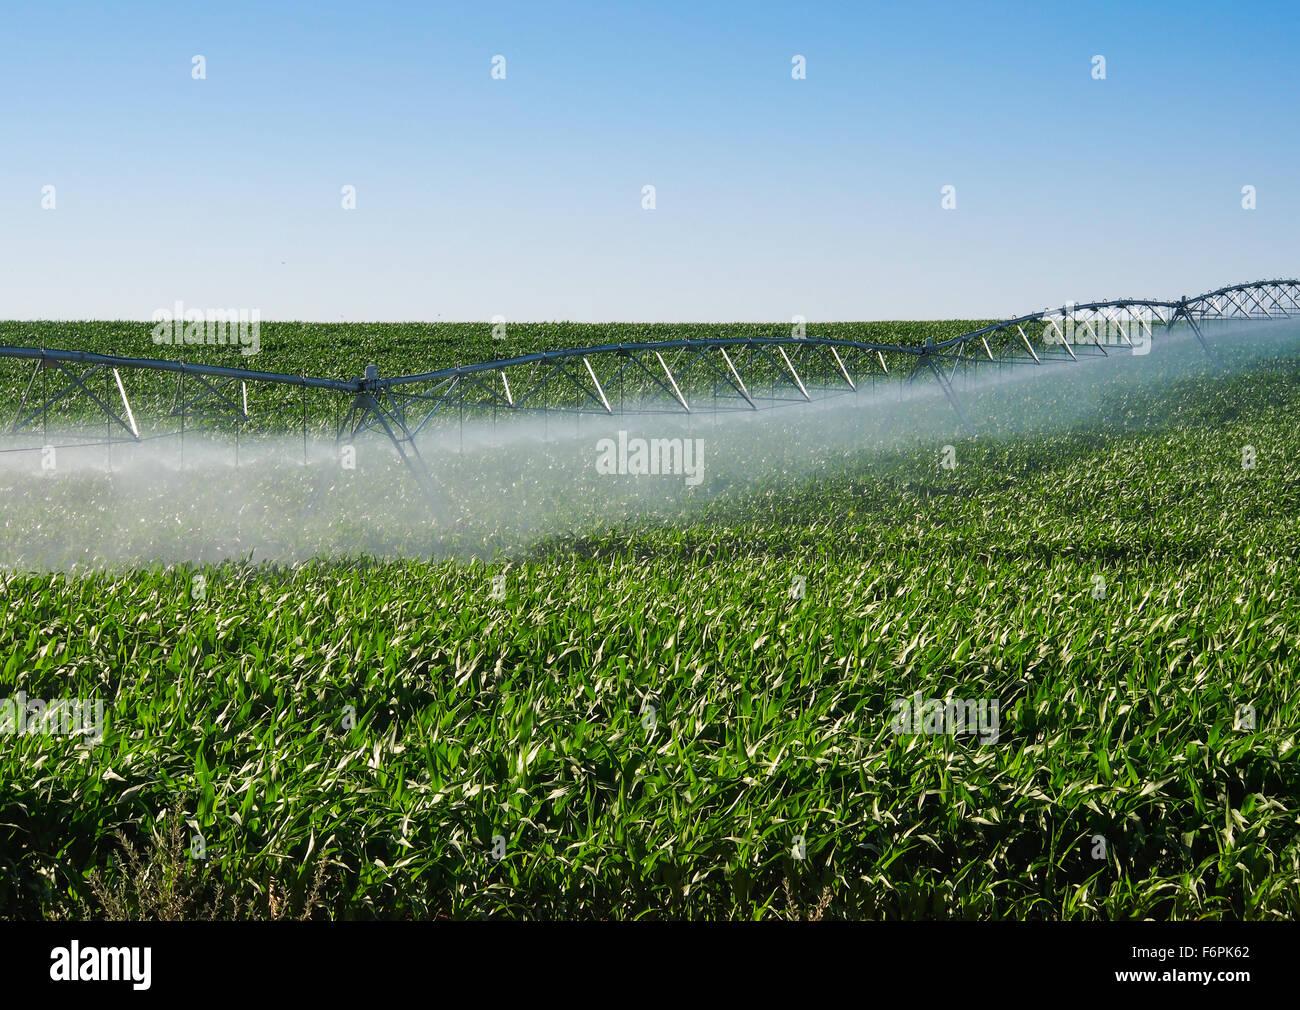 Irrigation pivot on a green field - Stock Image